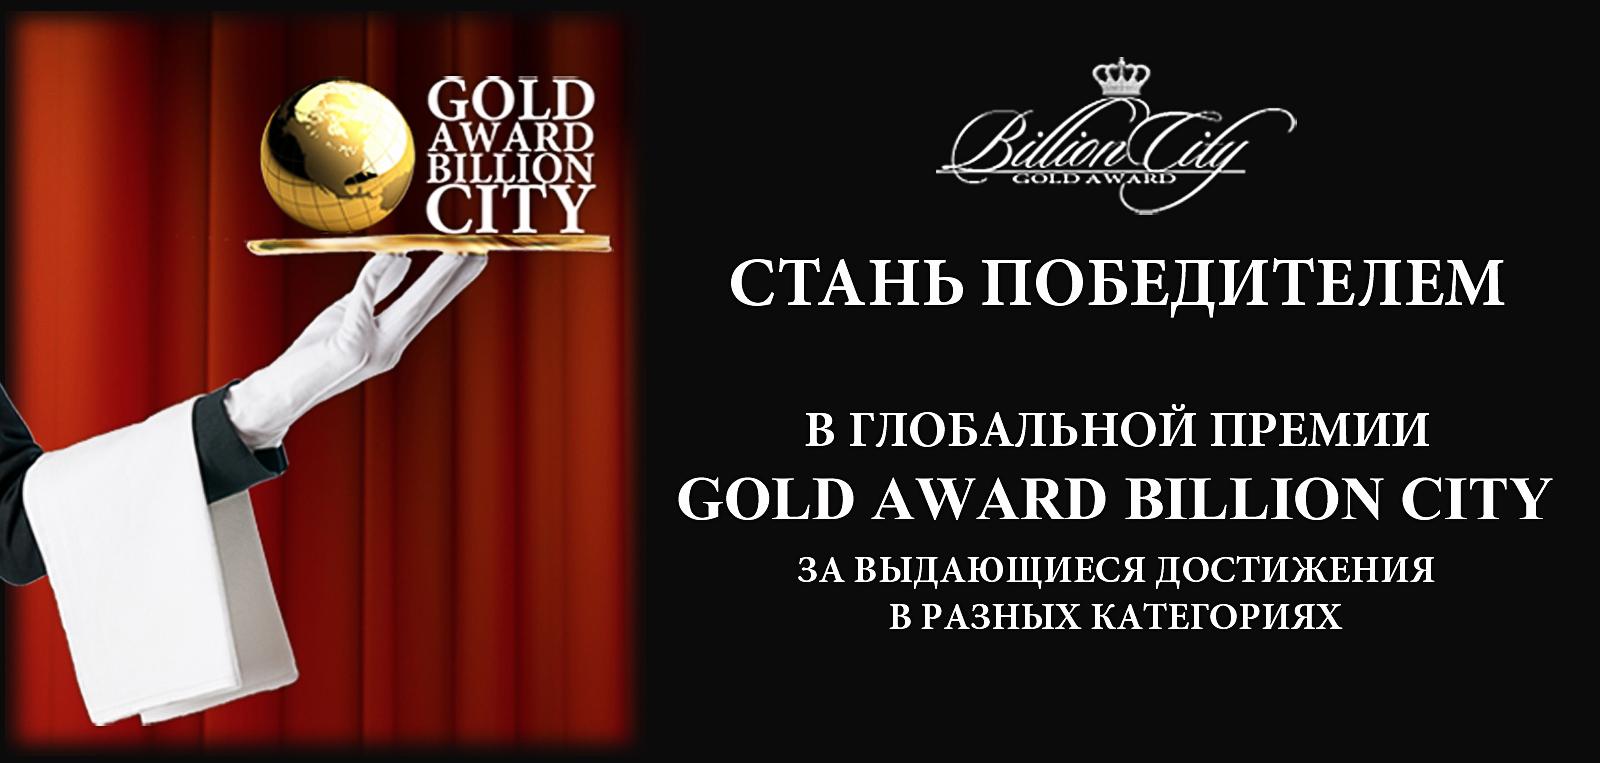 Премия Gold Award Billion City